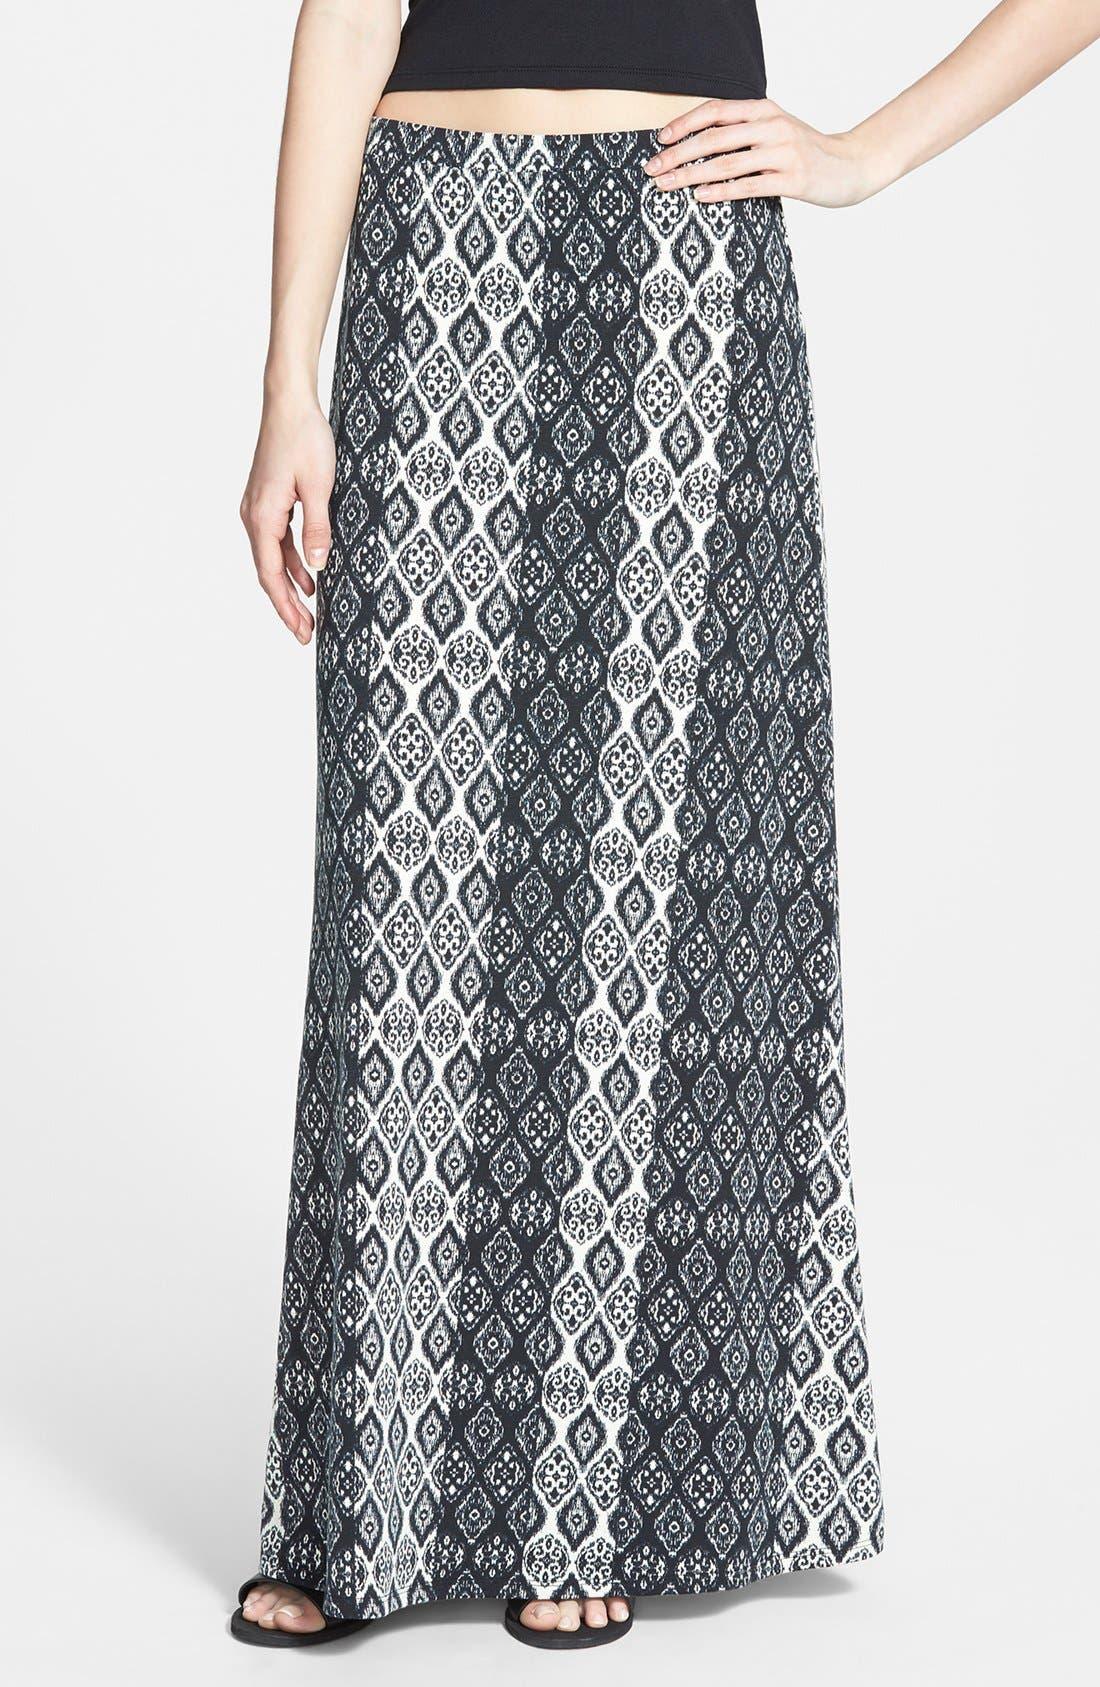 Alternate Image 1 Selected - Lily White Maxi Skirt (Juniors)